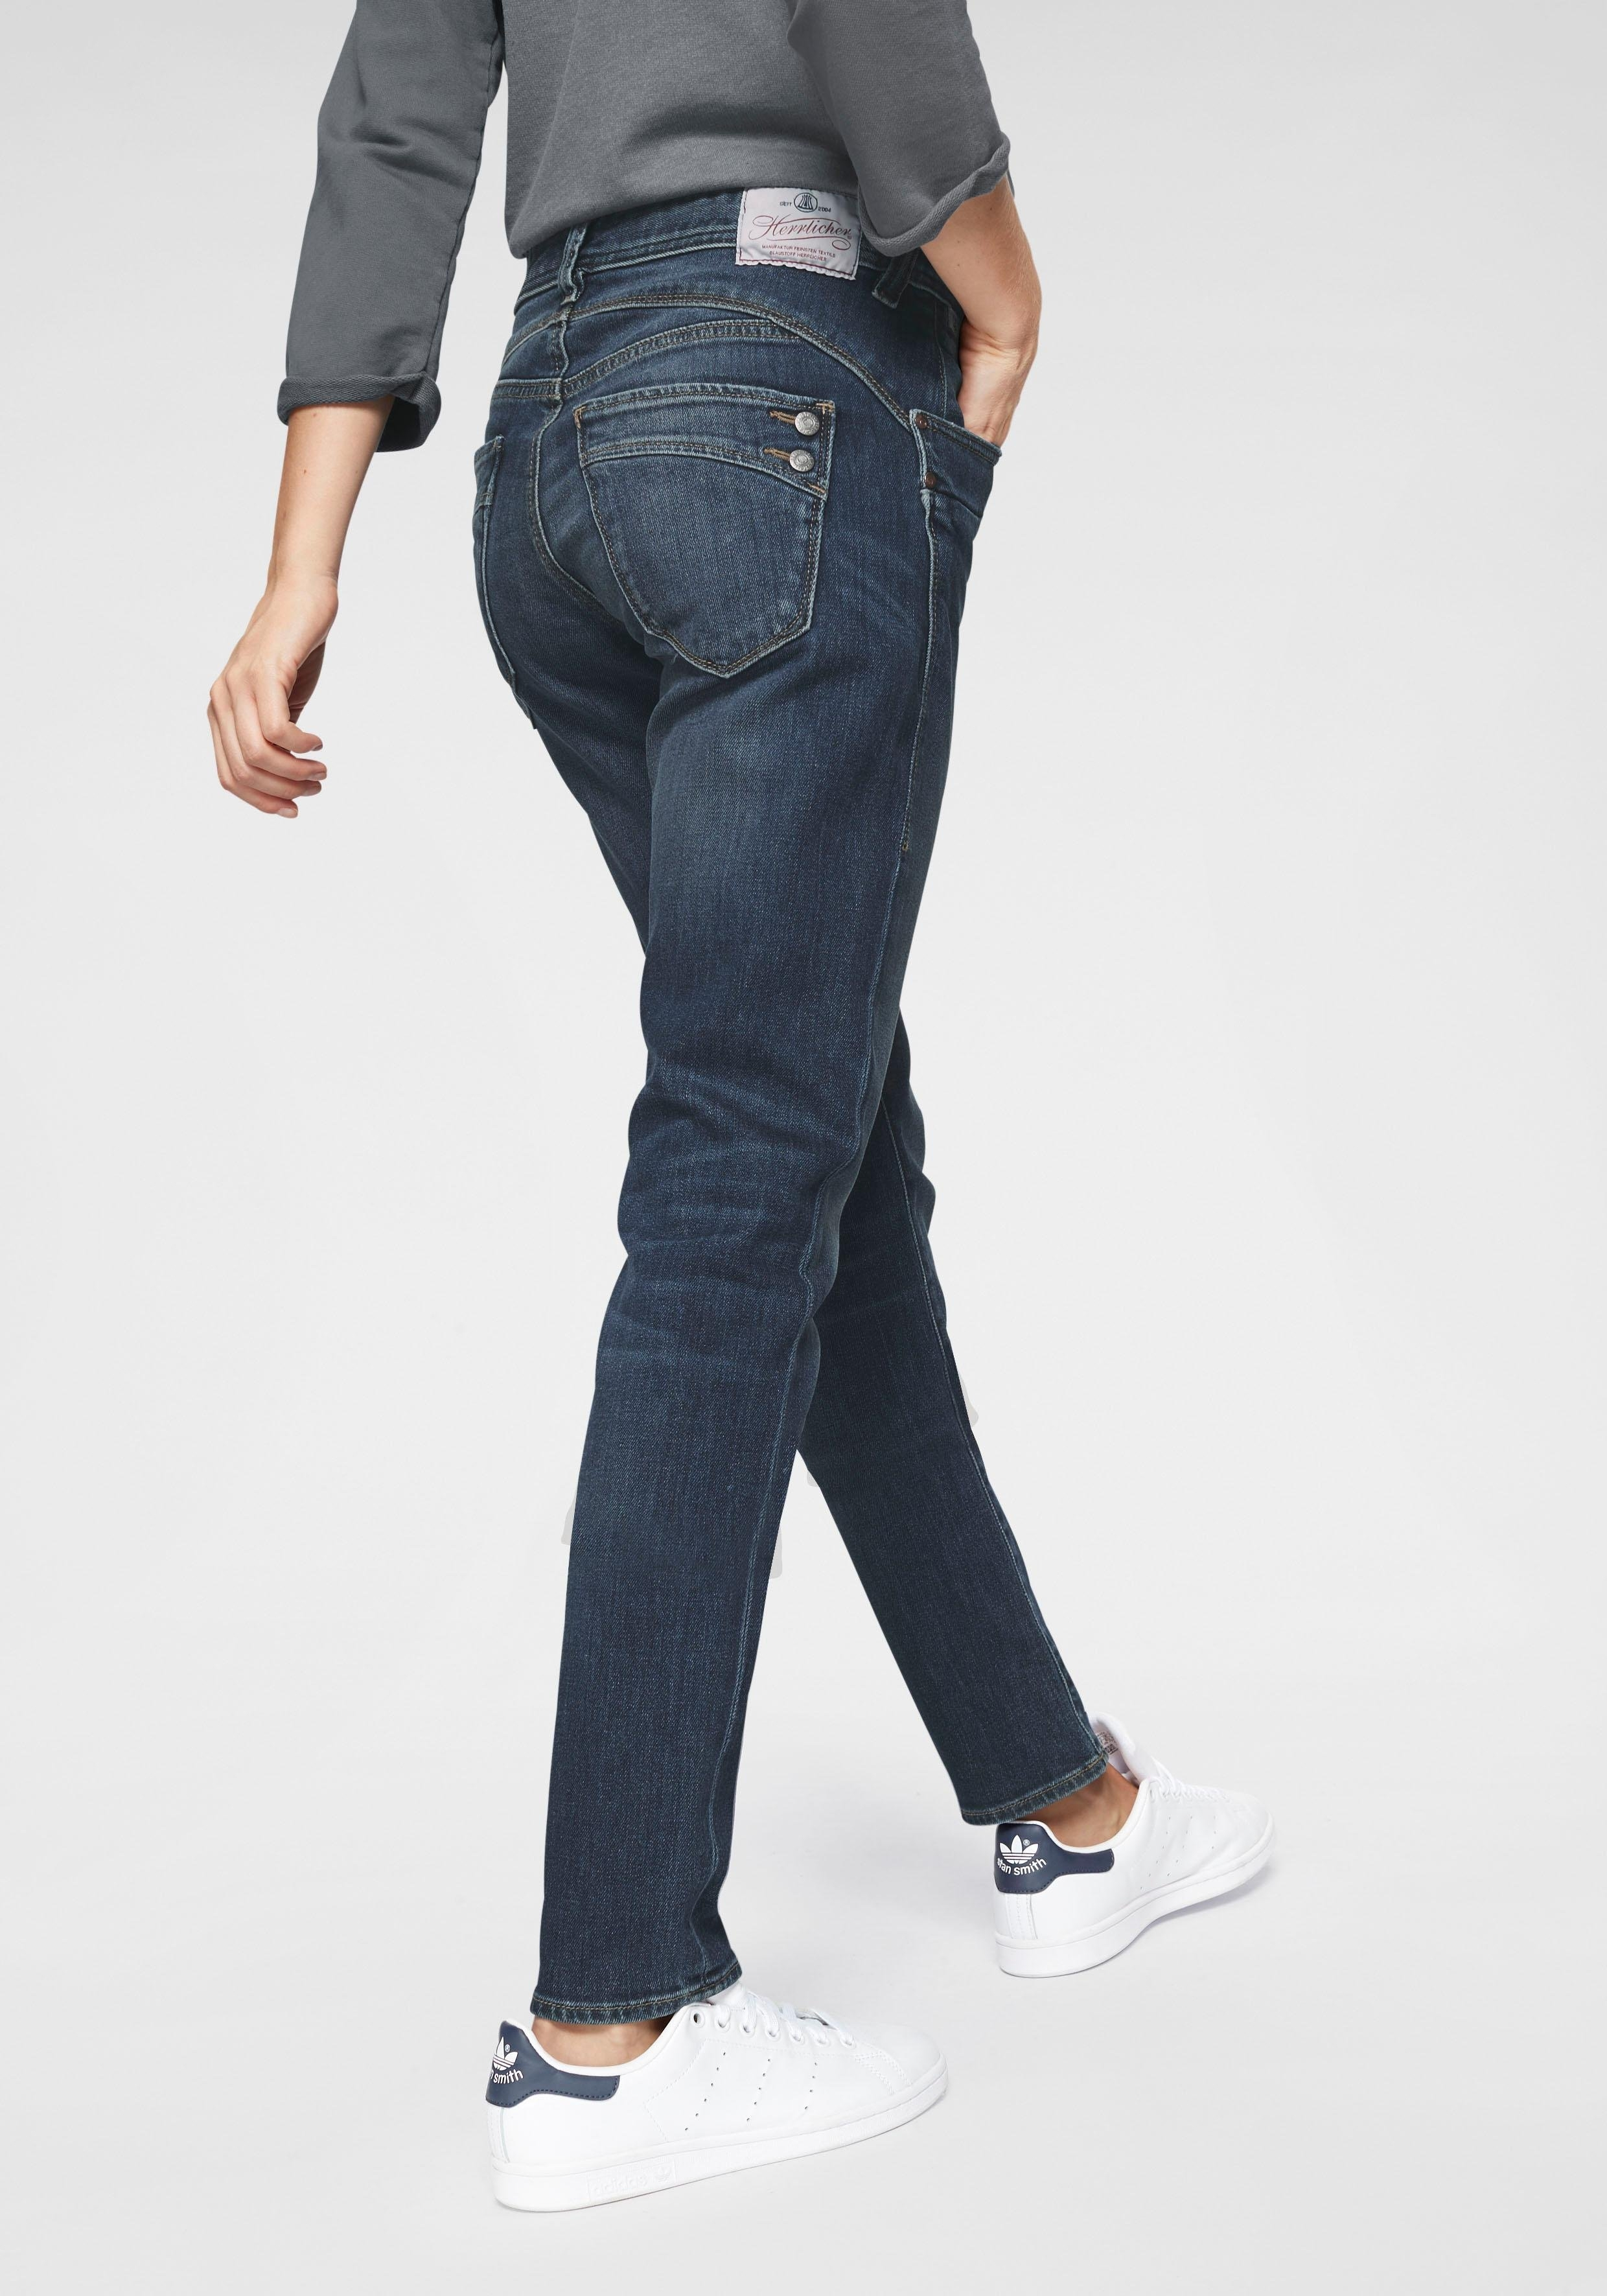 Herrlicher boyfriend jeans bestellen: 14 dagen bedenktijd